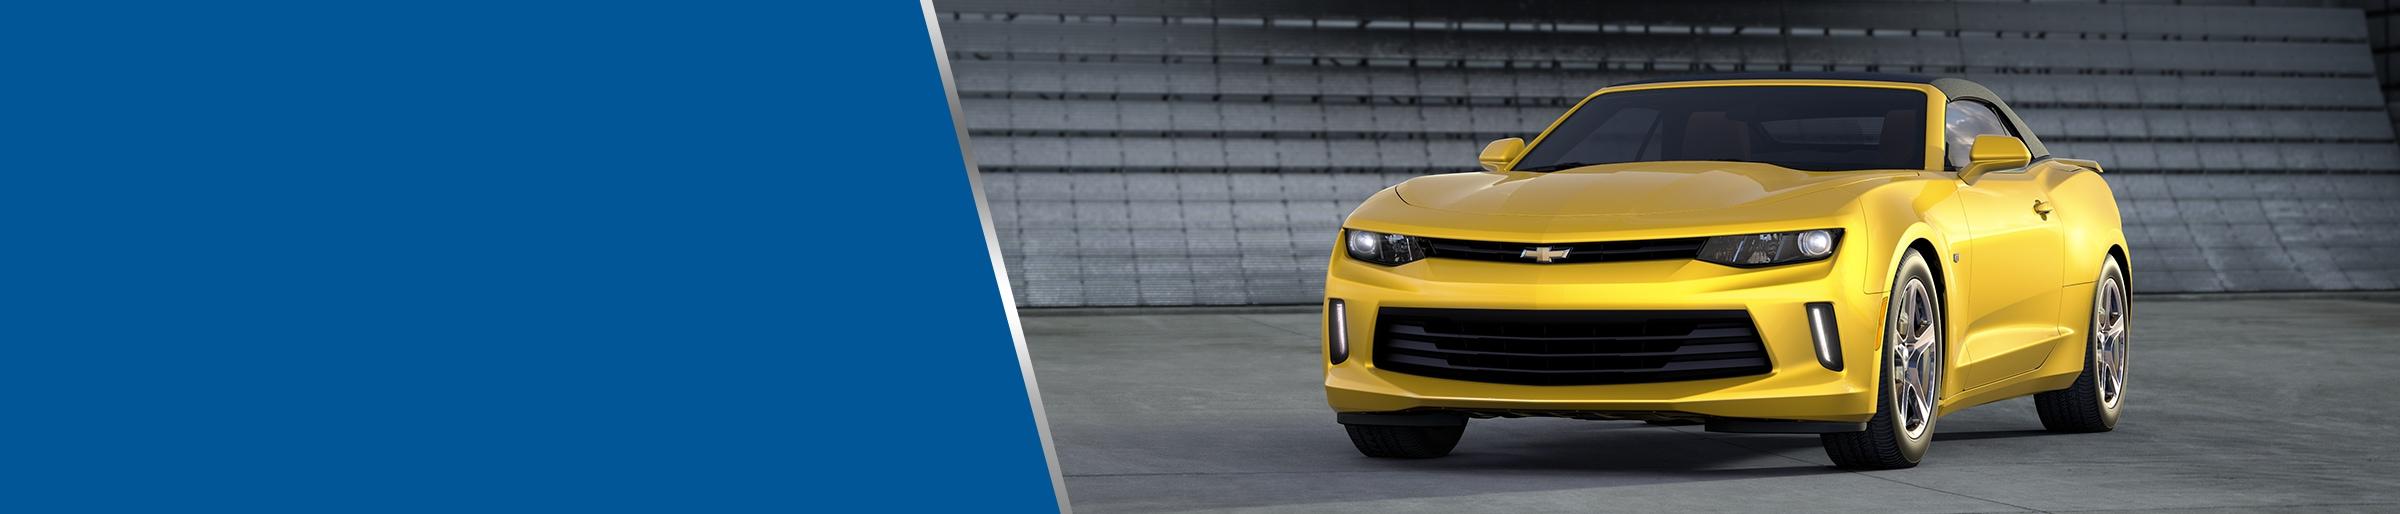 Hendrick Automotive Group Charlotte Nc 28212